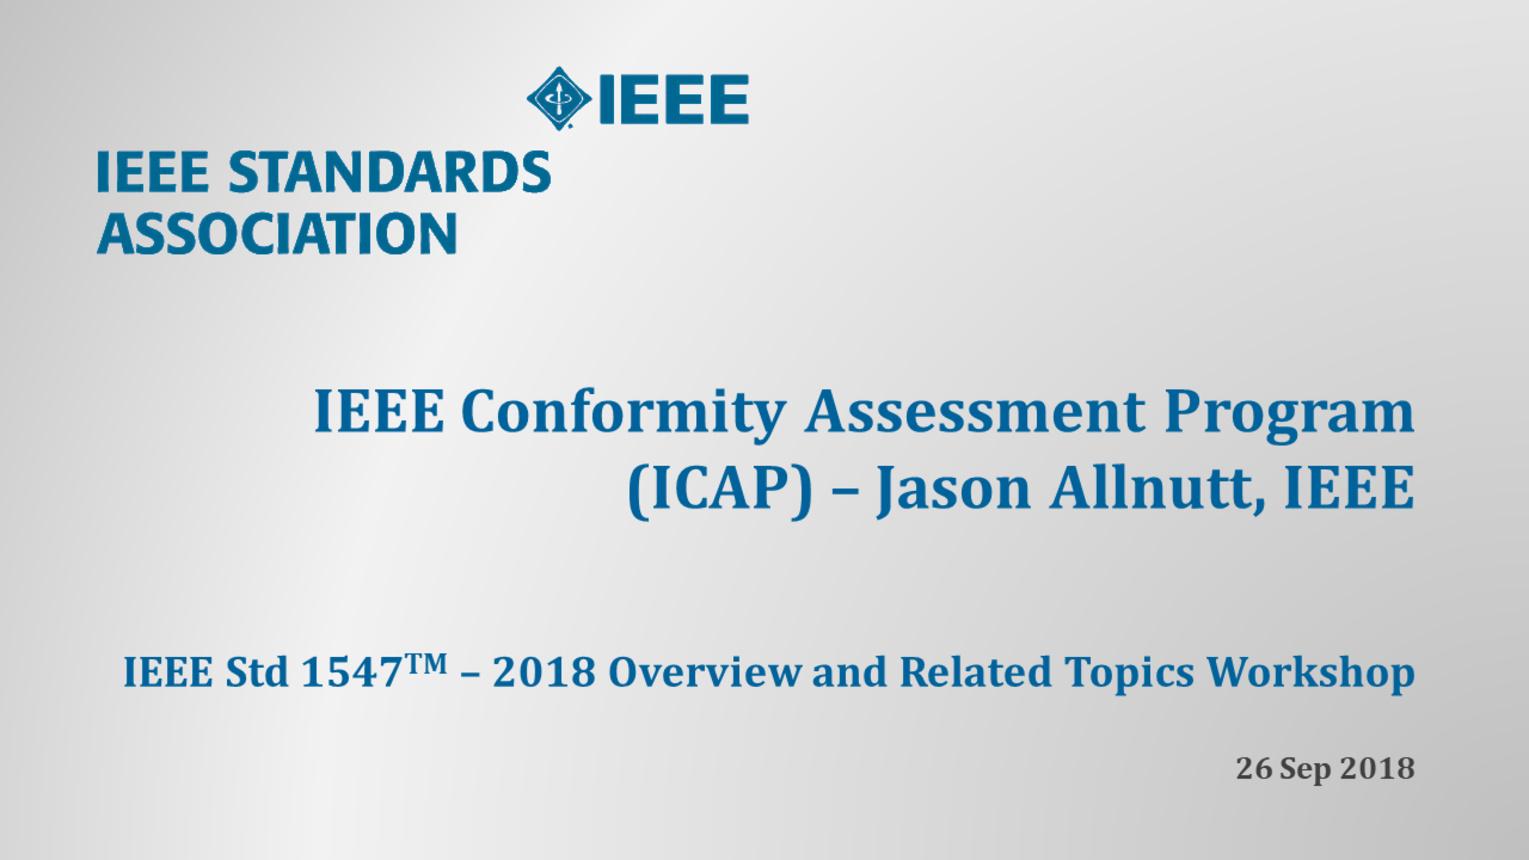 IEEE Std 1547 Workshop - NERC - Atlanta, GA - Sept. 2018: IEEE Conformity Assessment Program - Jason Allnutt